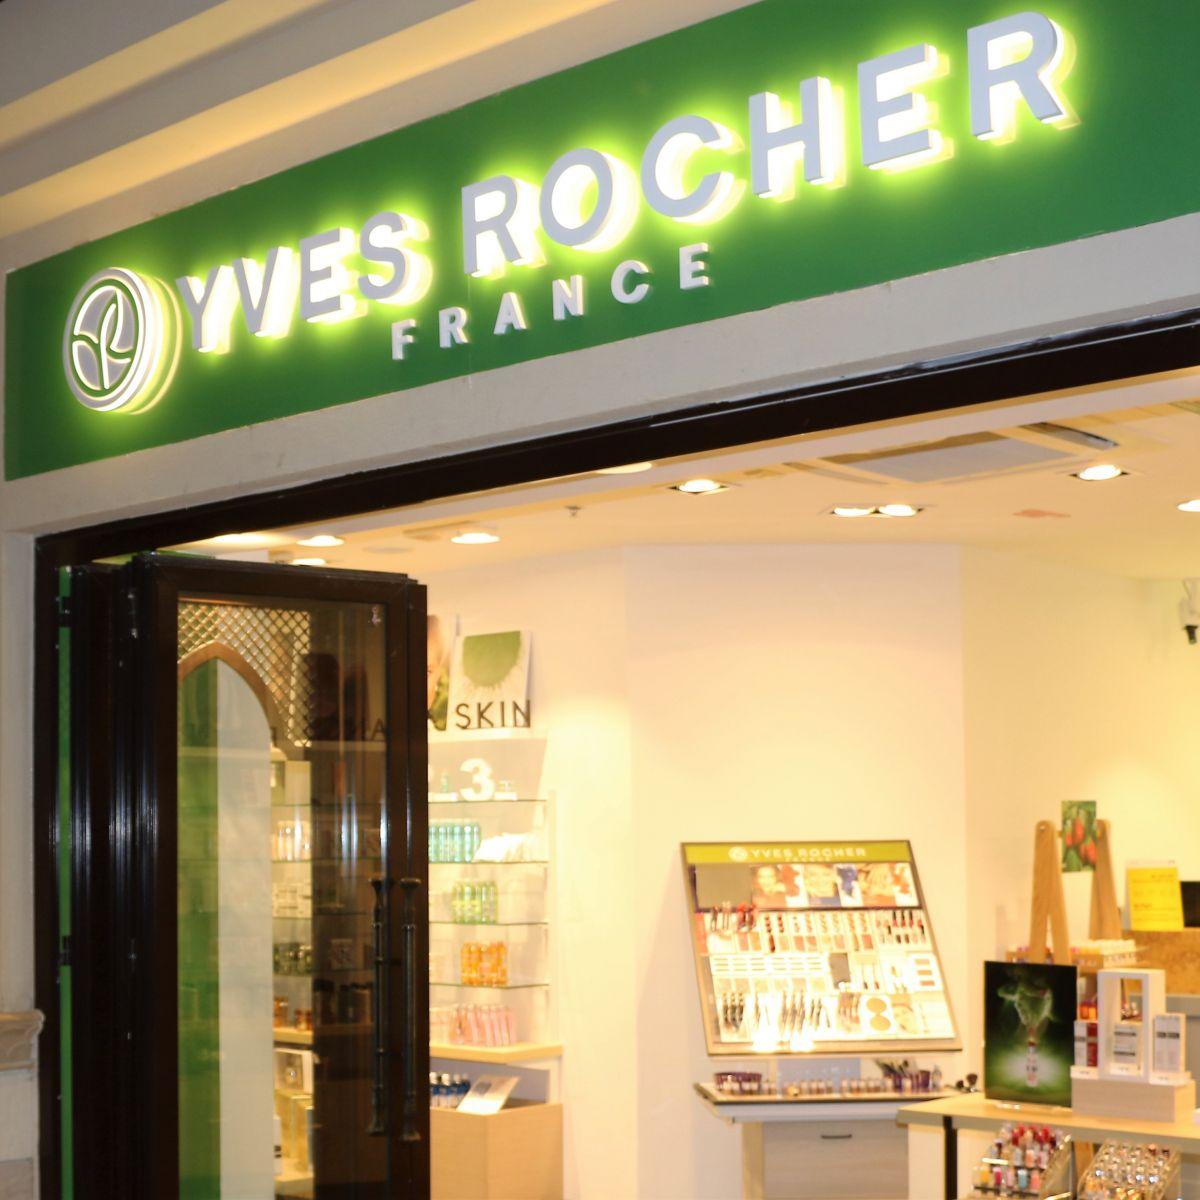 YVES ROCHER - SOUK EL BAHAR